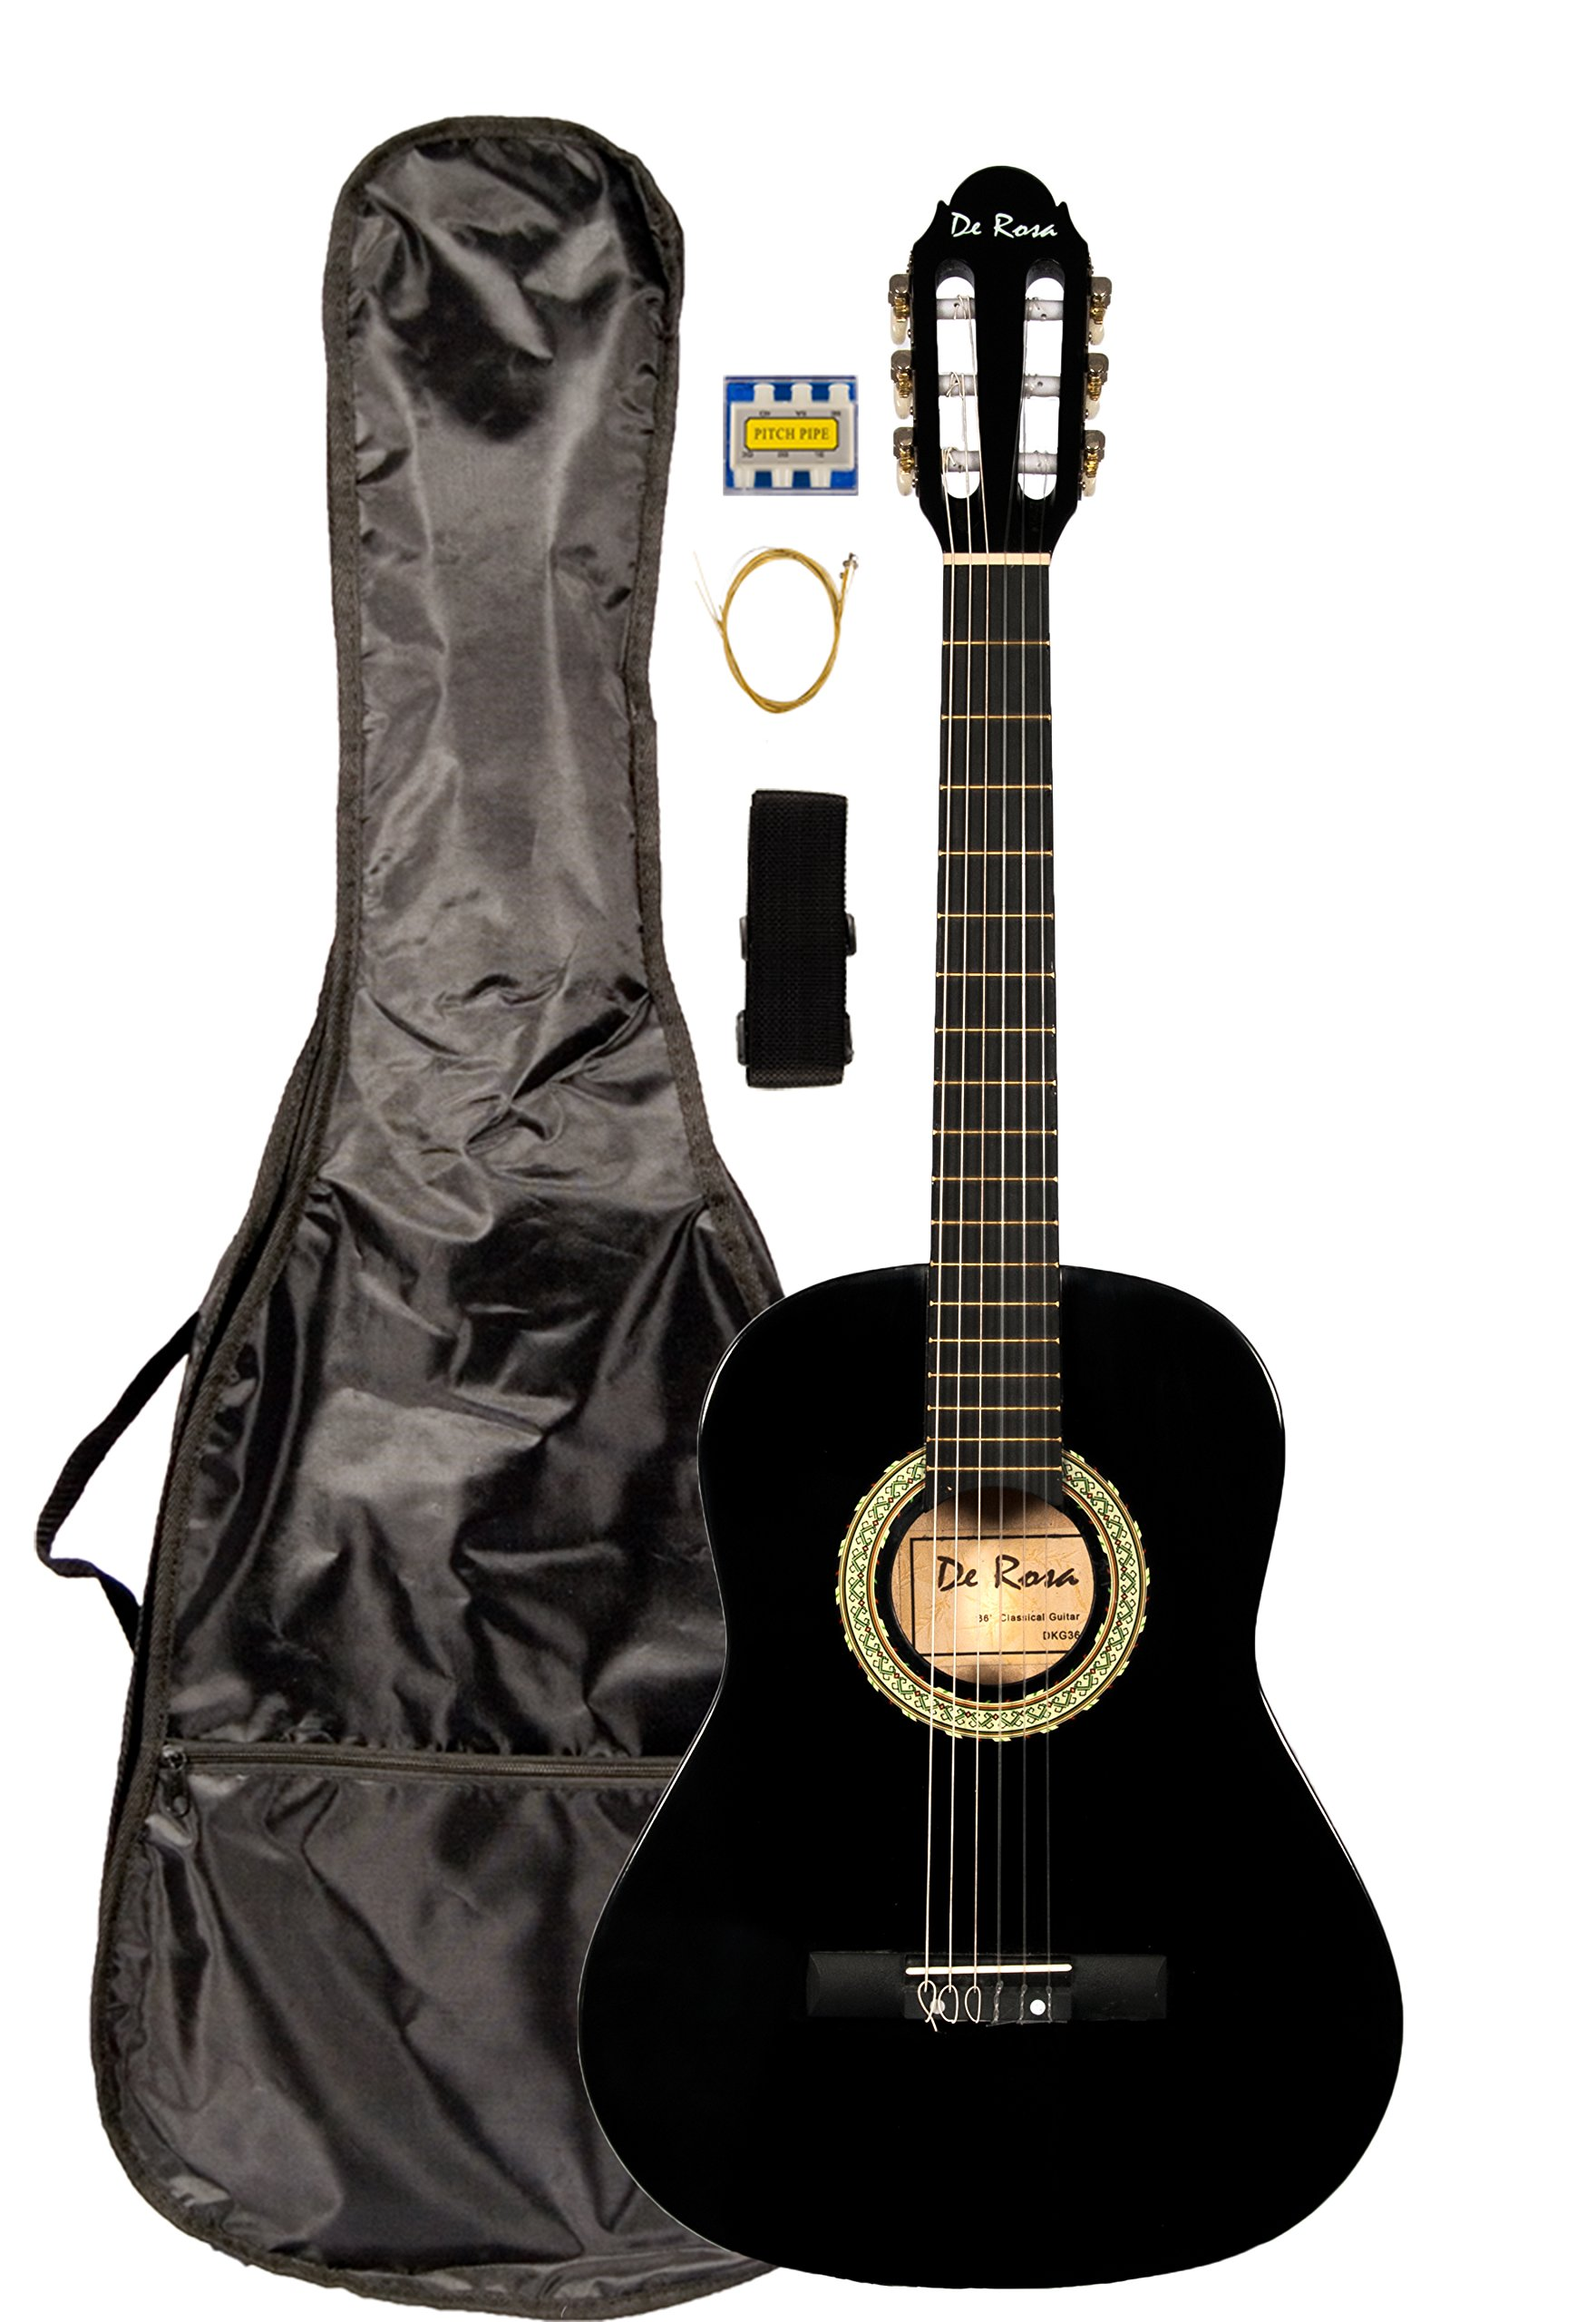 36 INCH DeRosa DKF36 Kid's BLACK 3/4 Classical Nylon String Guitar great for beginners